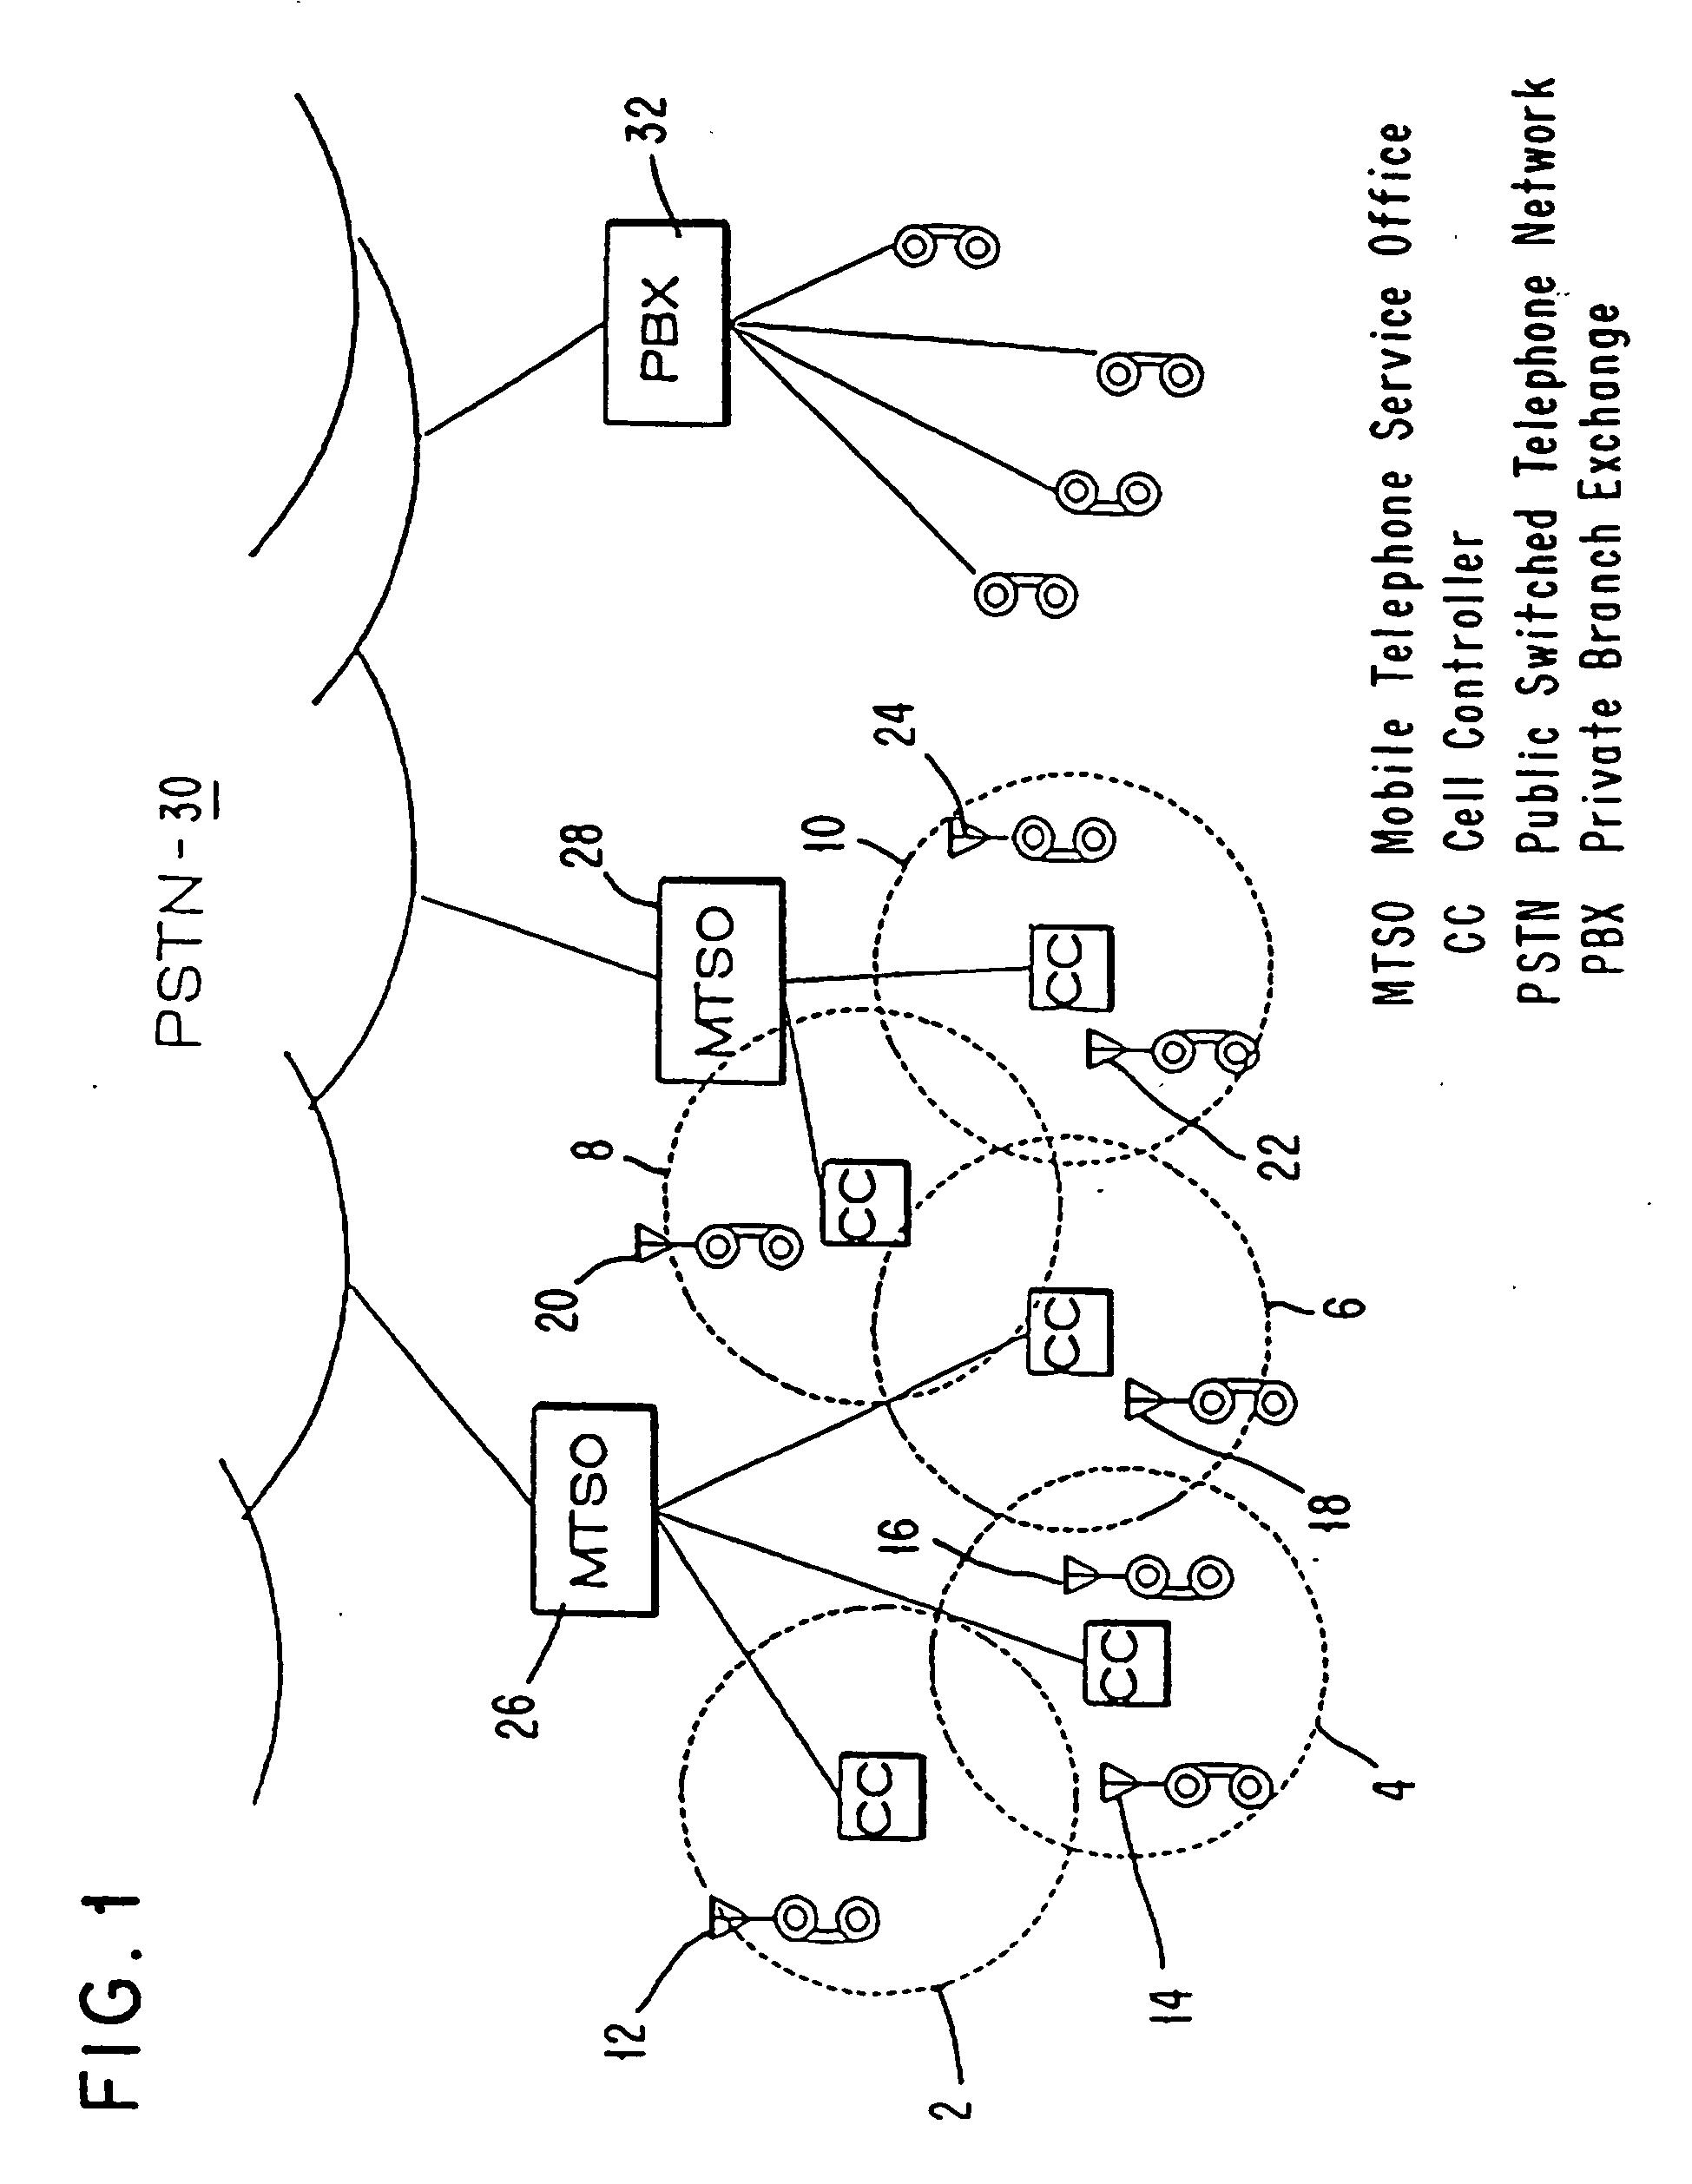 patent ep0622924b1 wide area cellular ad hoc wireless lan access Wireless LAN Diagram patent drawing